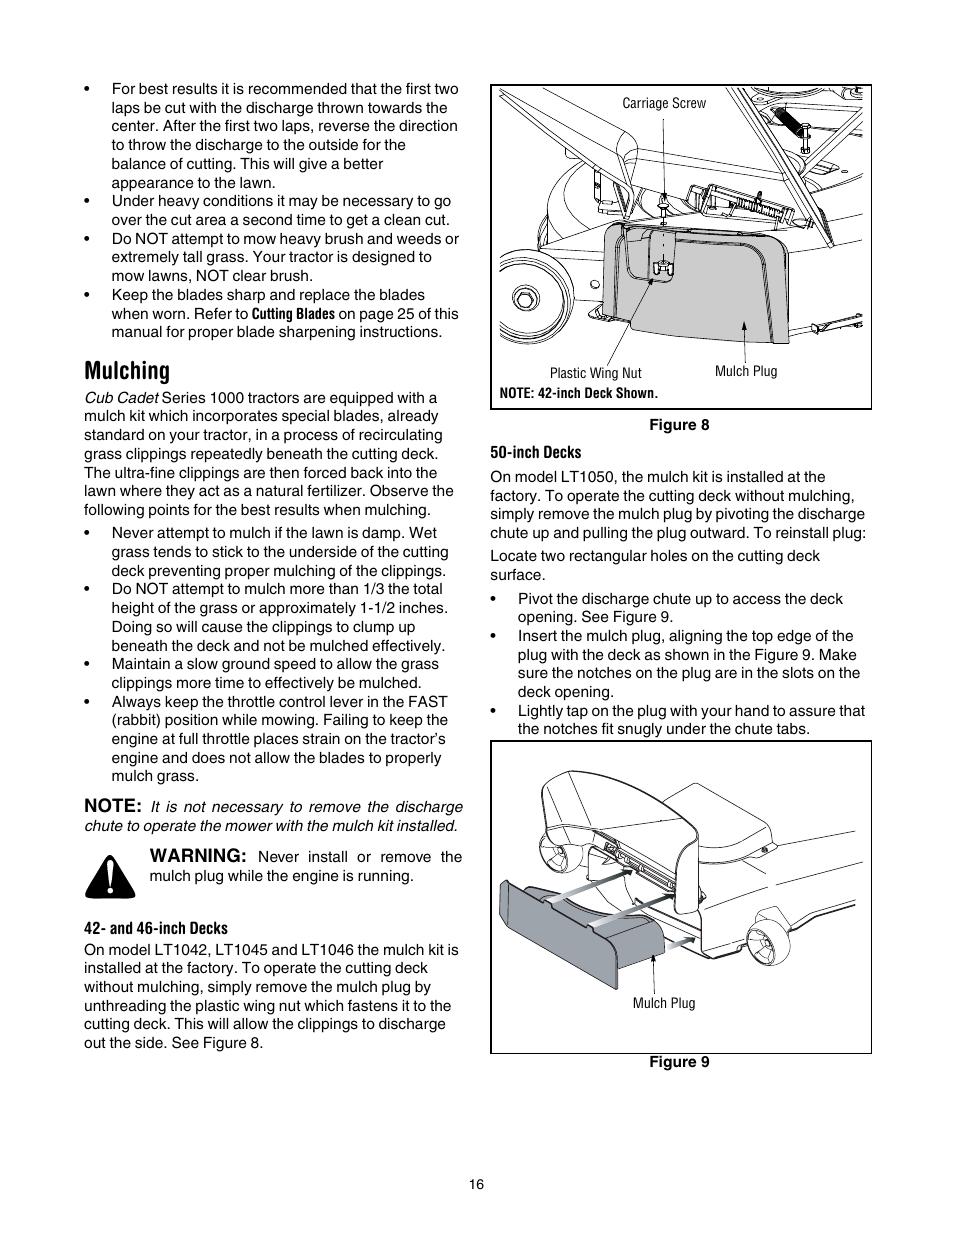 Mulching | Cub Cadet LT1042 User Manual | Page 16 / 40